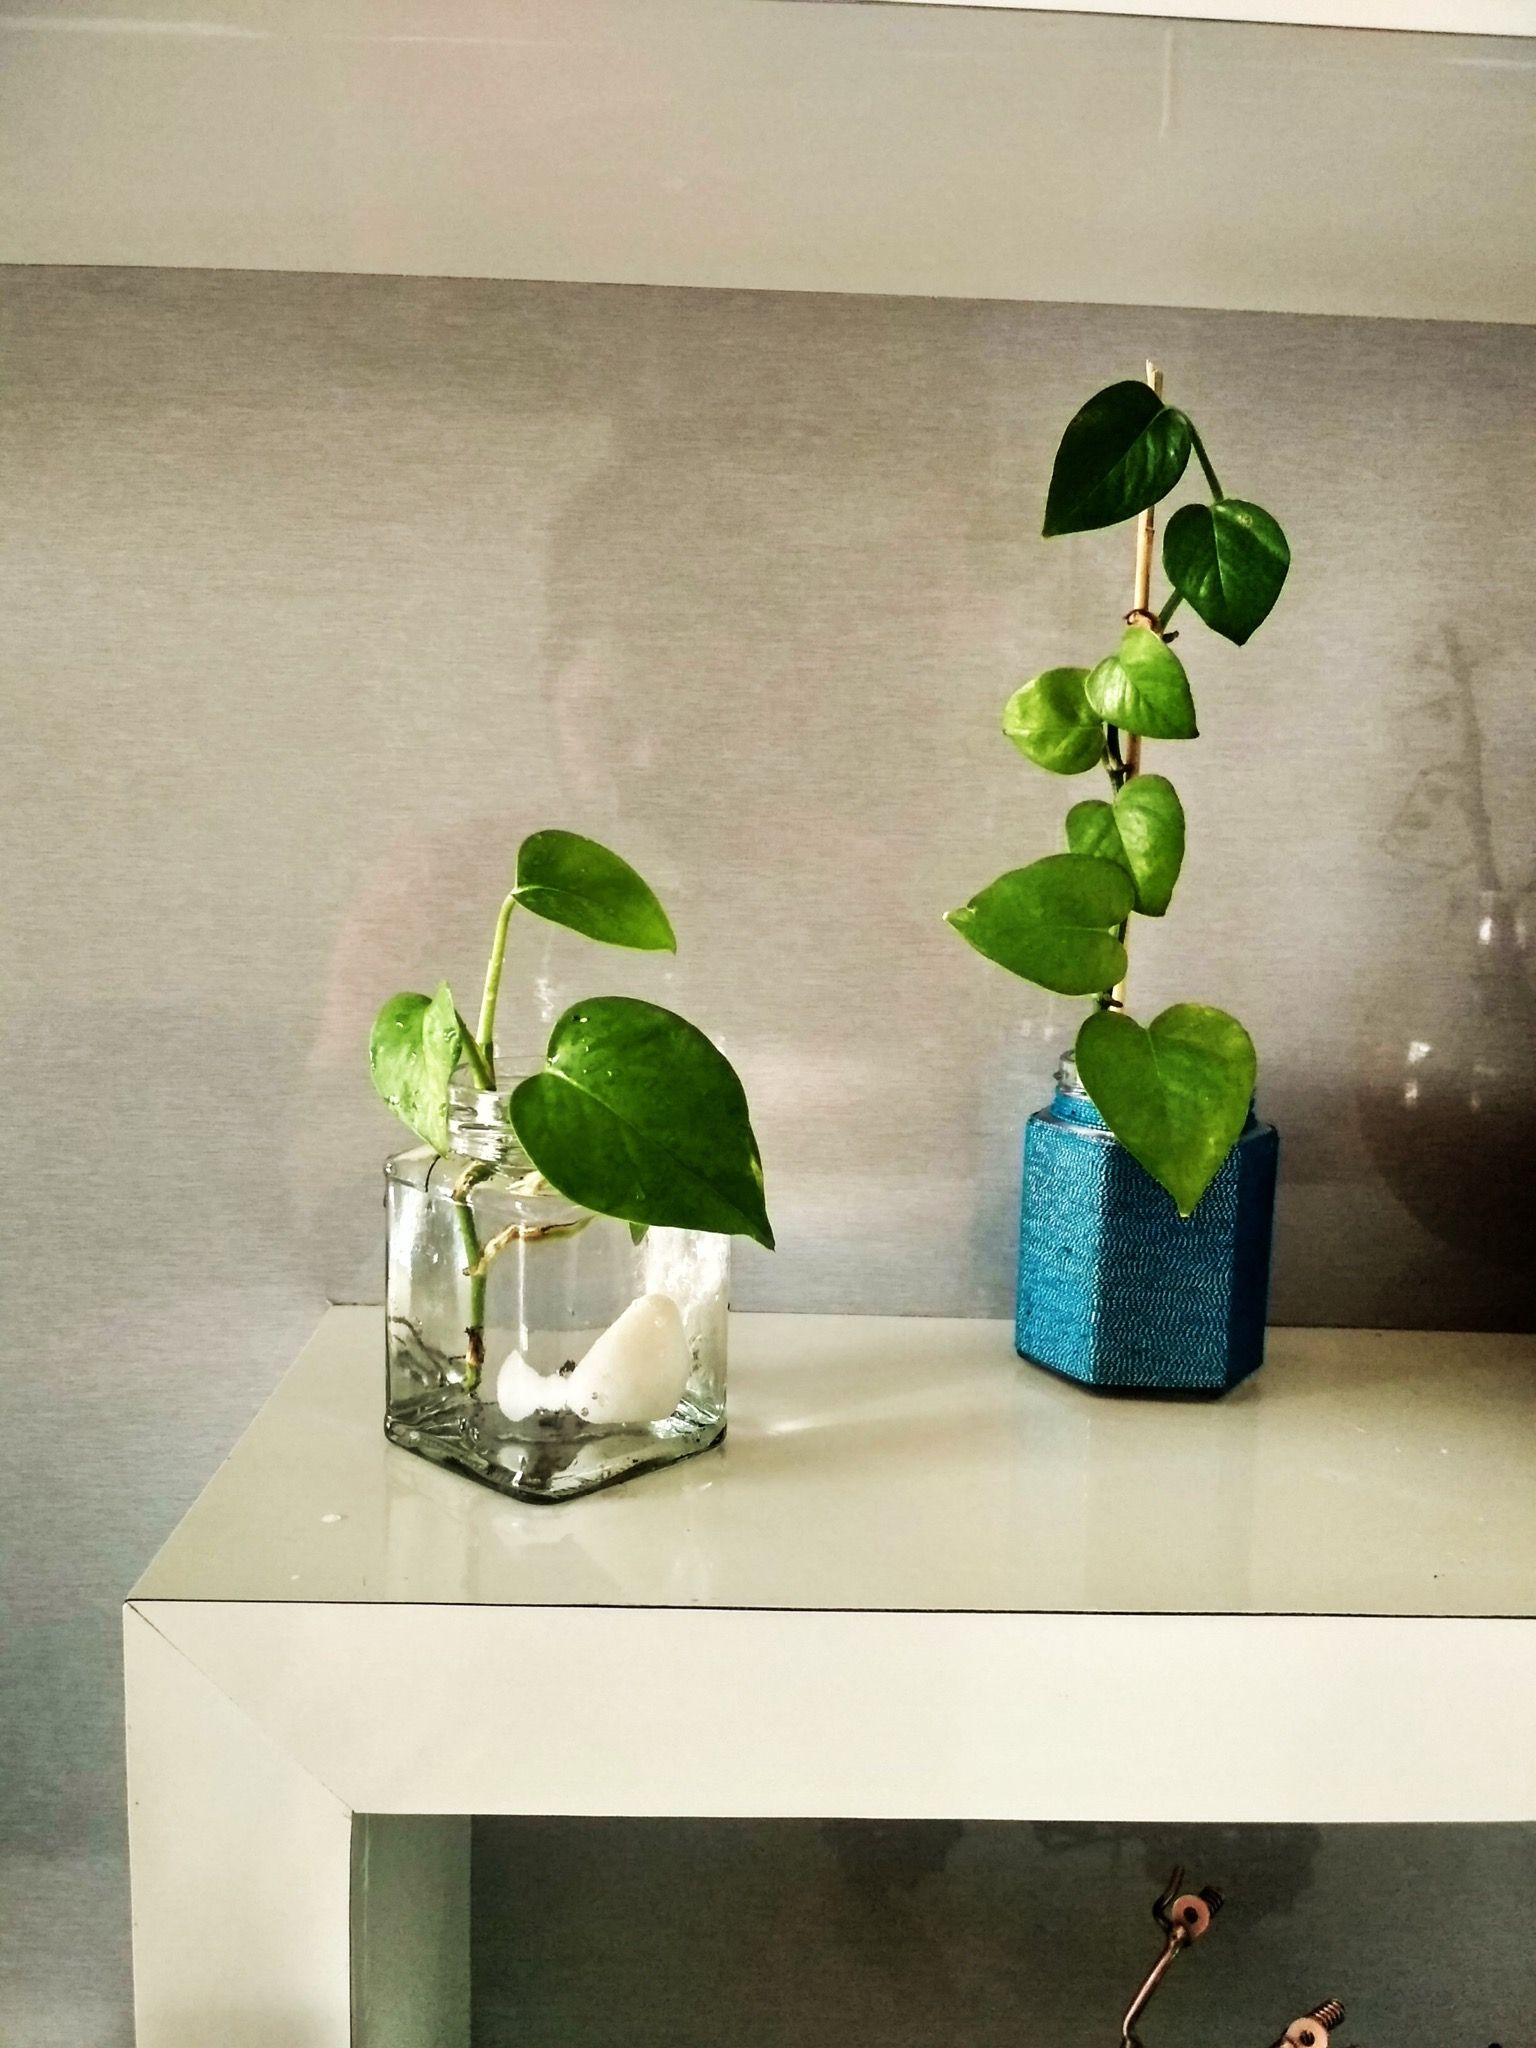 Money Plants Best For Indoor And Very Good For Decor Living Room Money Plant Indoor Indoor Plants Indoor Decor